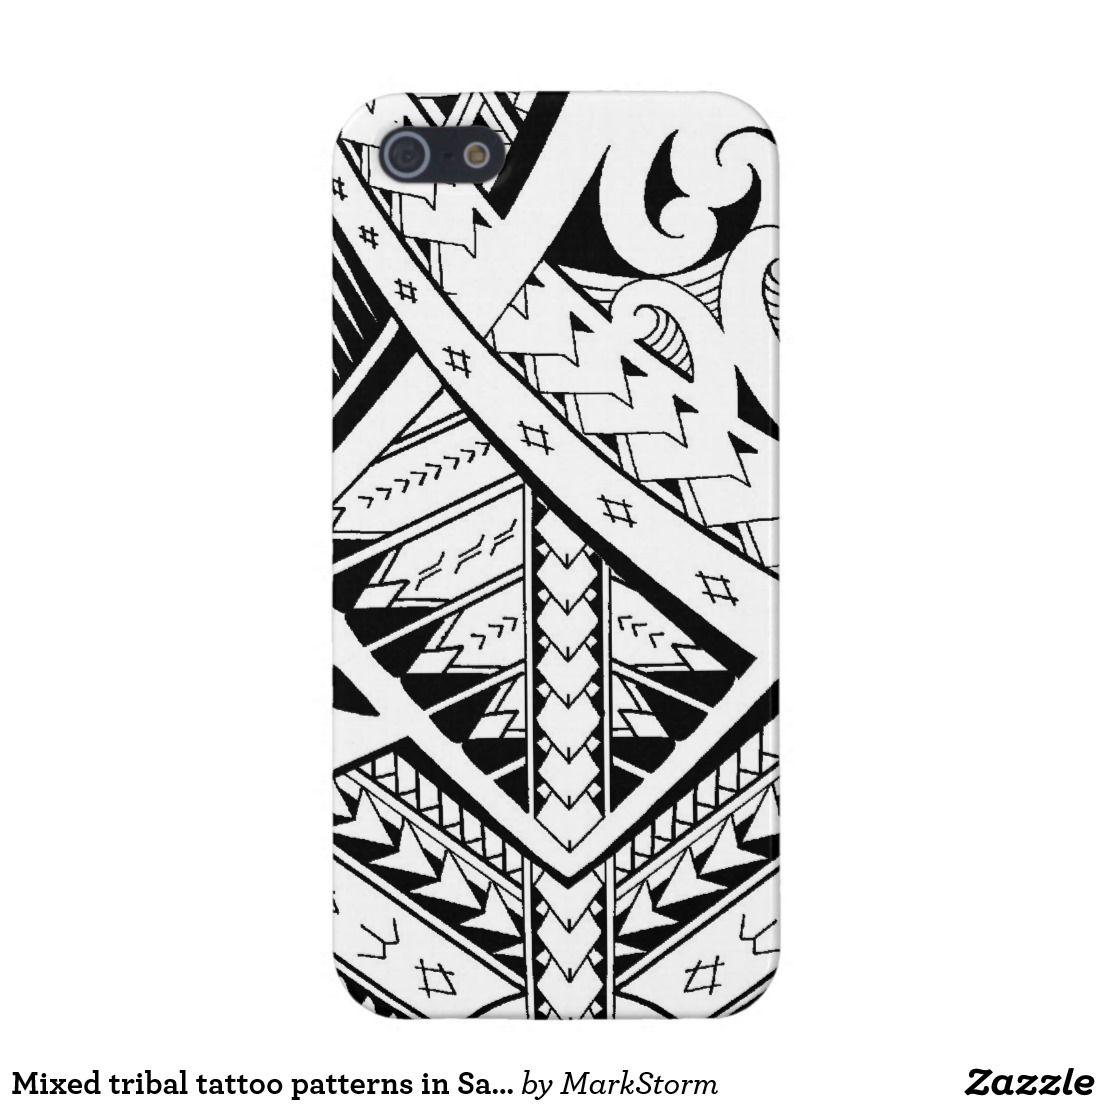 Mixed Tribal Tattoo Patterns In Samoan Maori Style Iphone